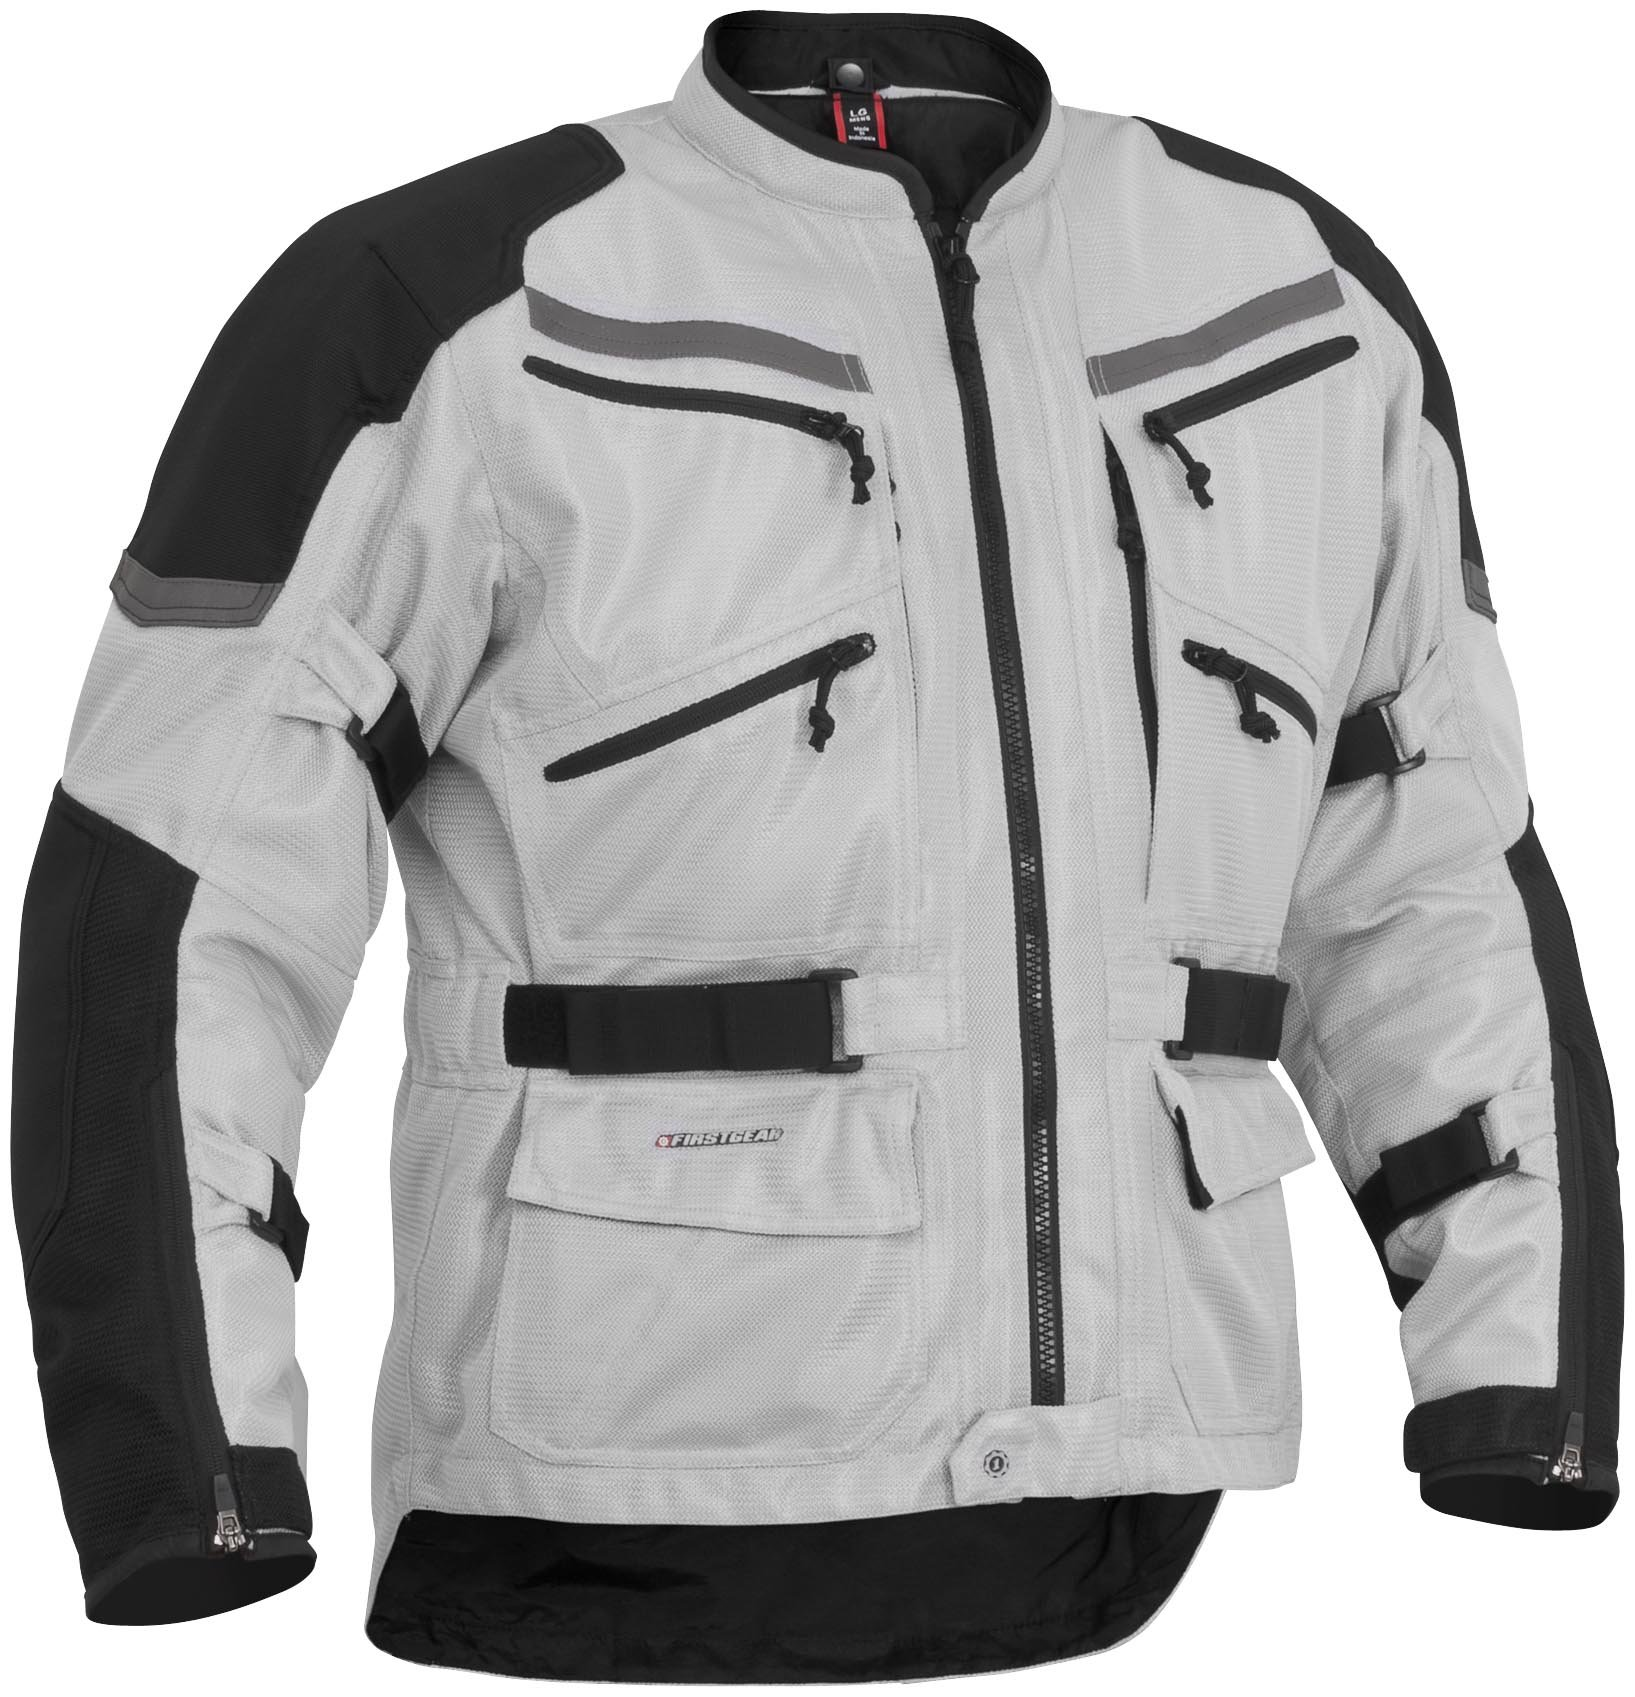 Firstgear Adventure Mesh Silver/Black Jacket, M - Tall